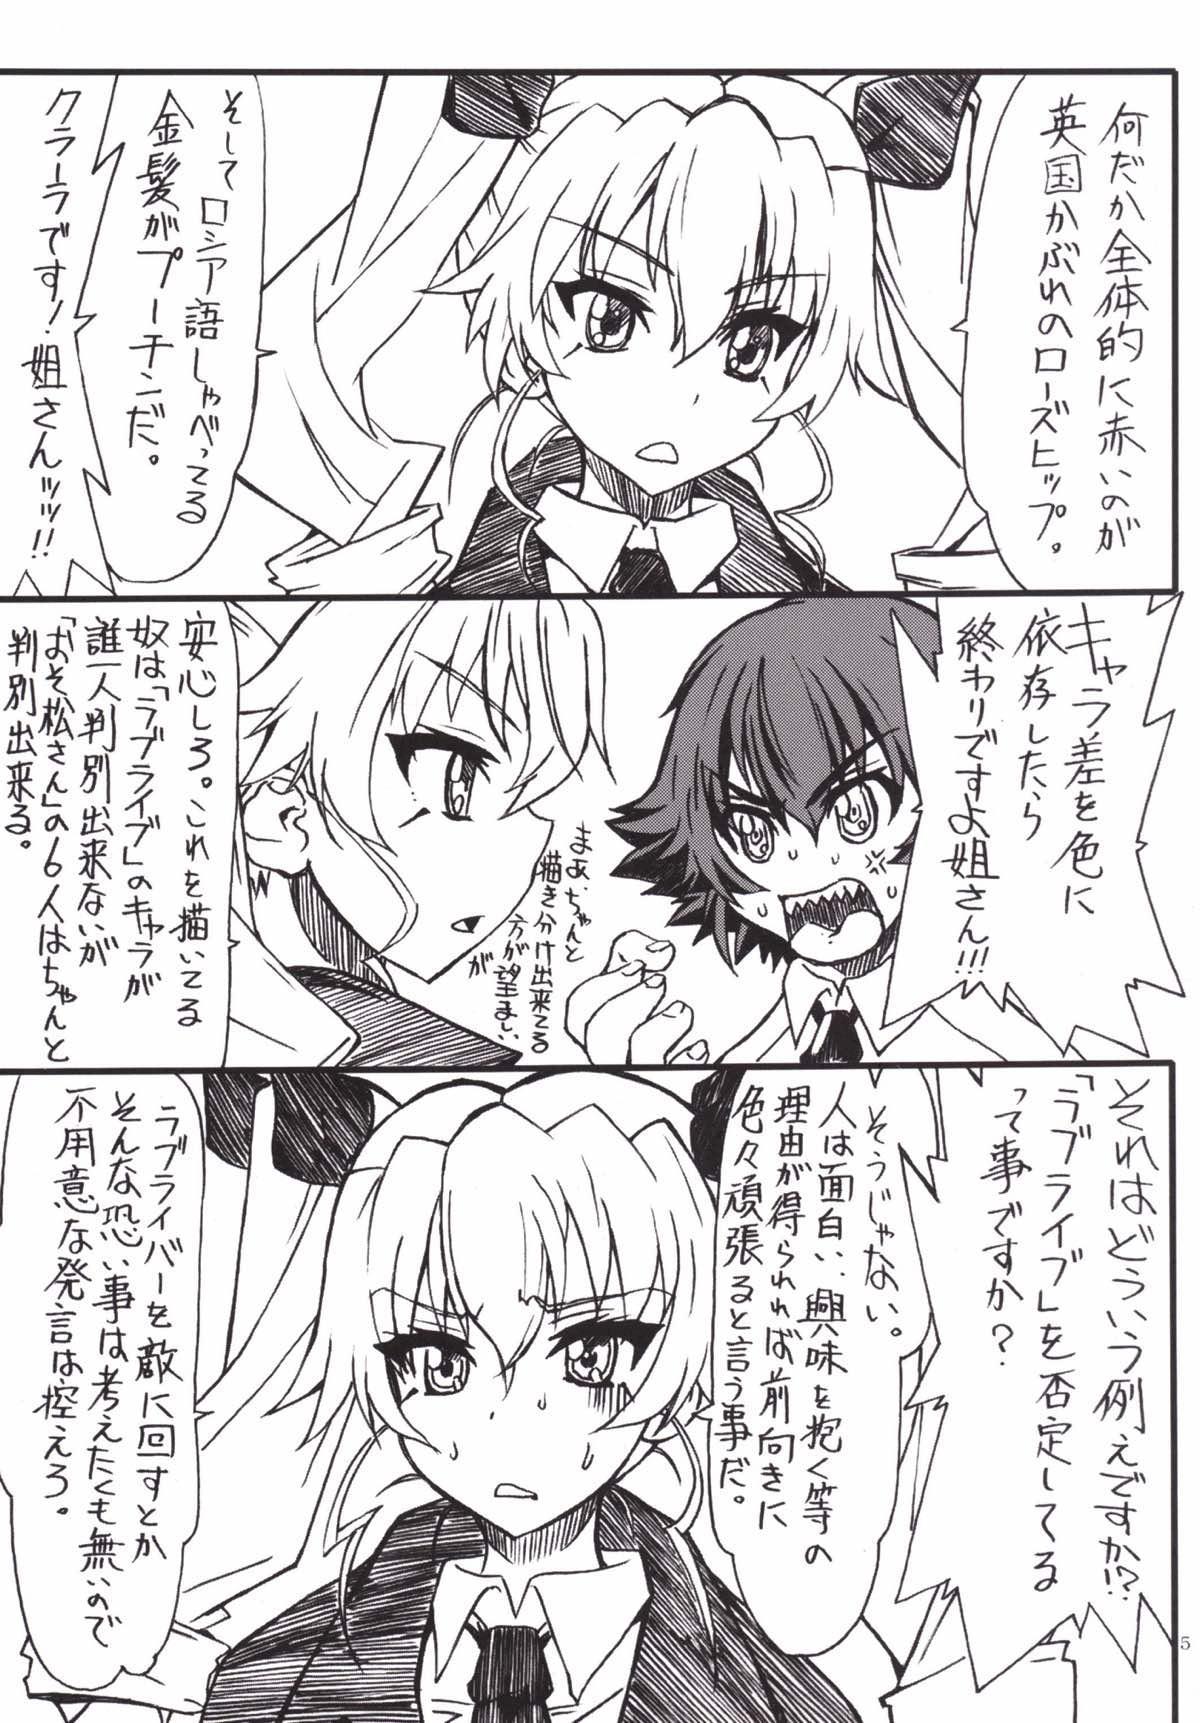 The Chiyomi 3